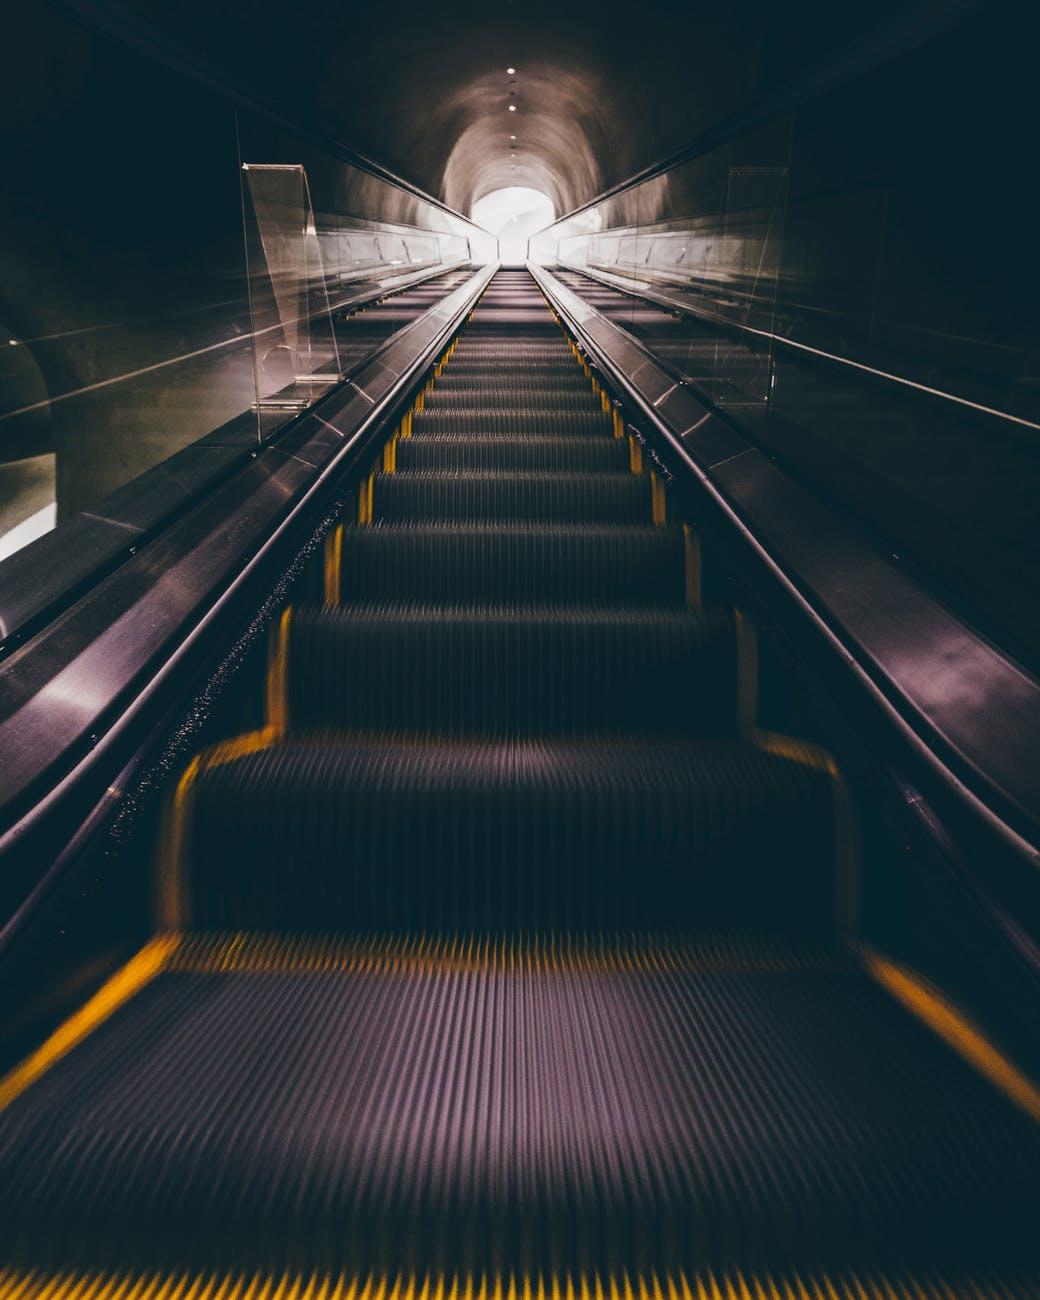 blur carry dark escalator